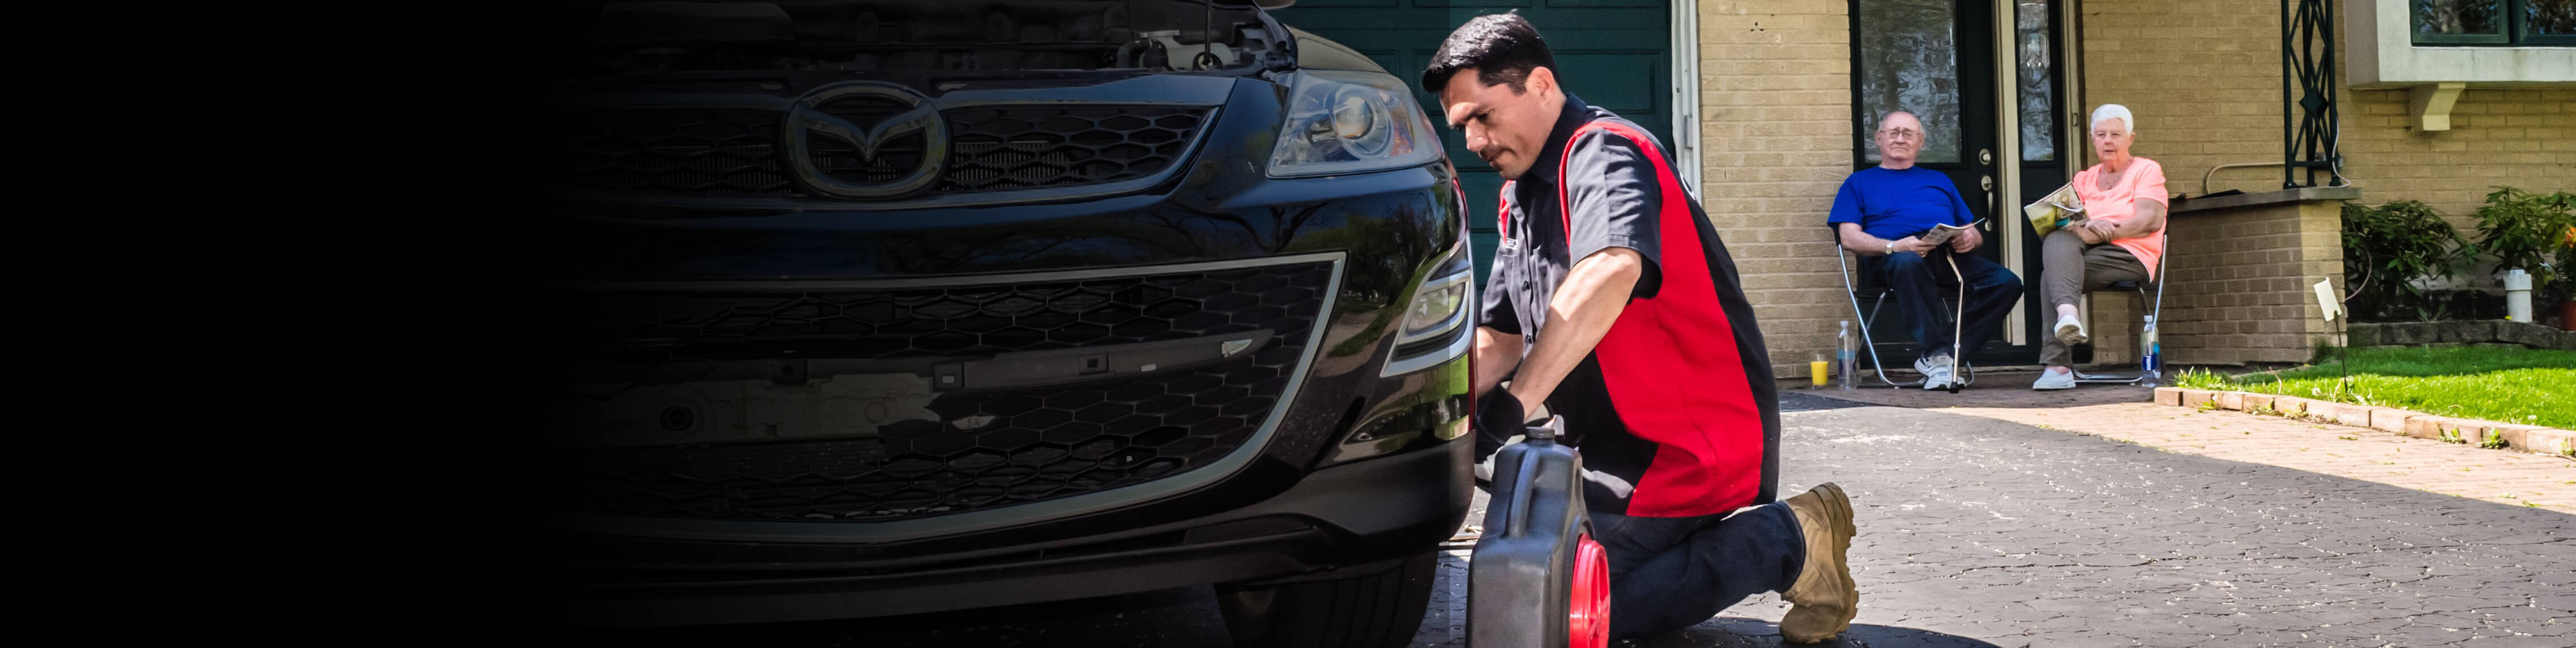 Mechanics in San Mateo CA | Auto Repair at Your Location